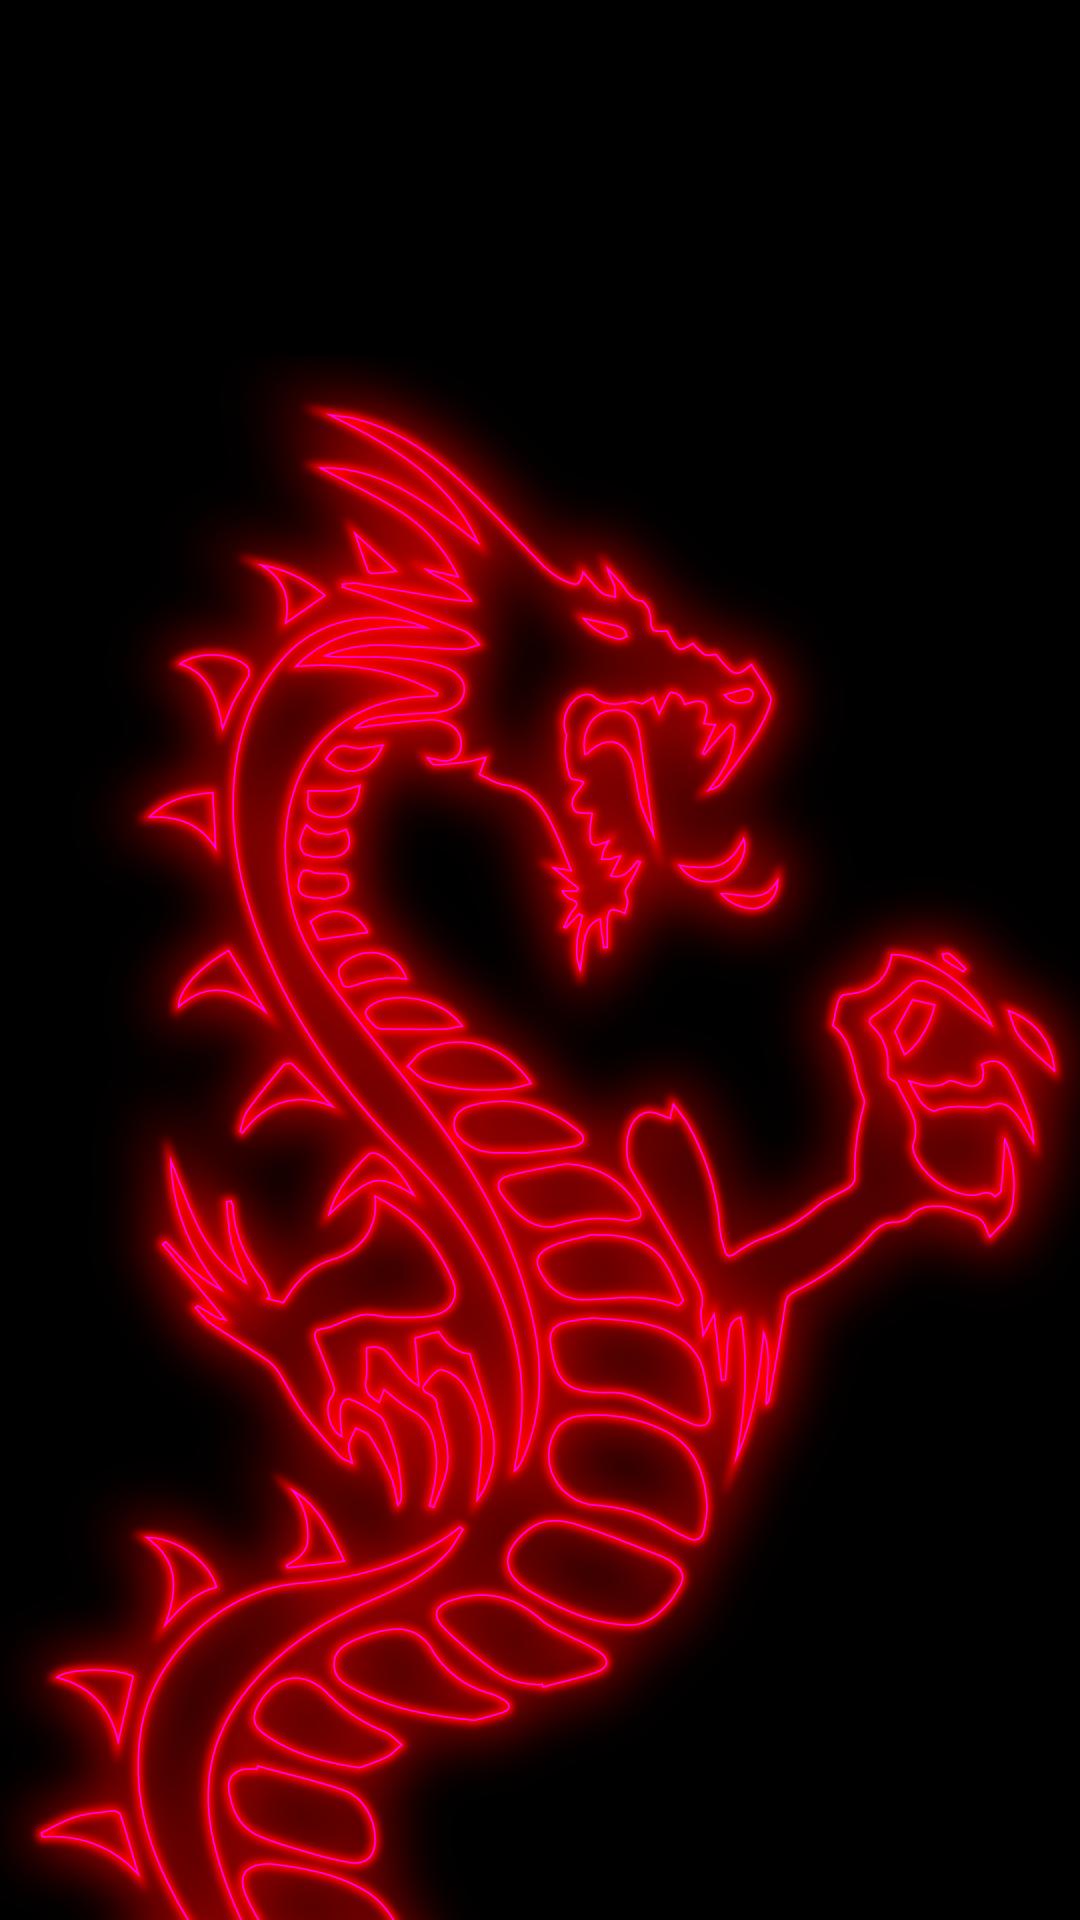 1080p wallpaper phone Amoled neon Dragon Background